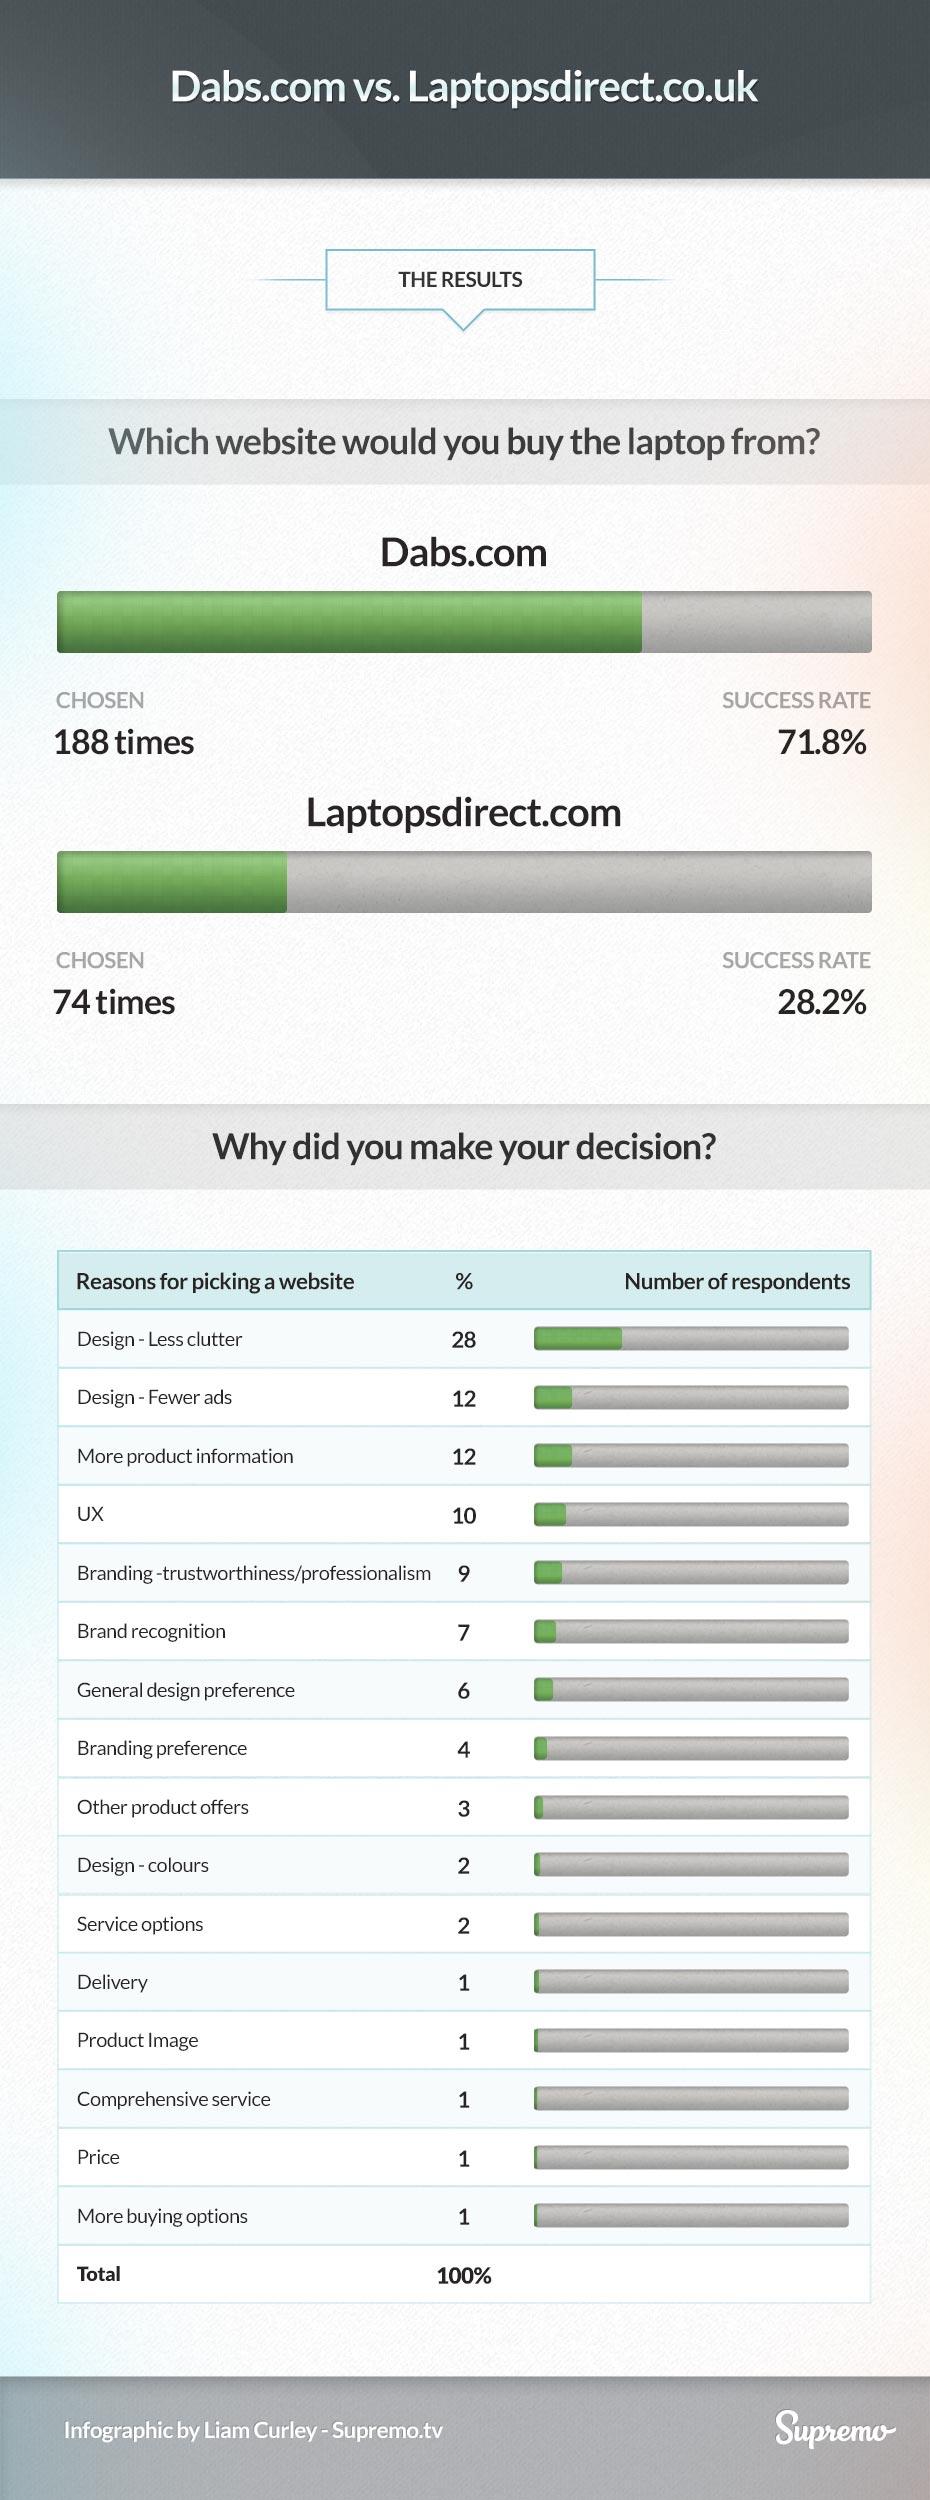 dabs-v-laptopsdirect-infographic-1-large